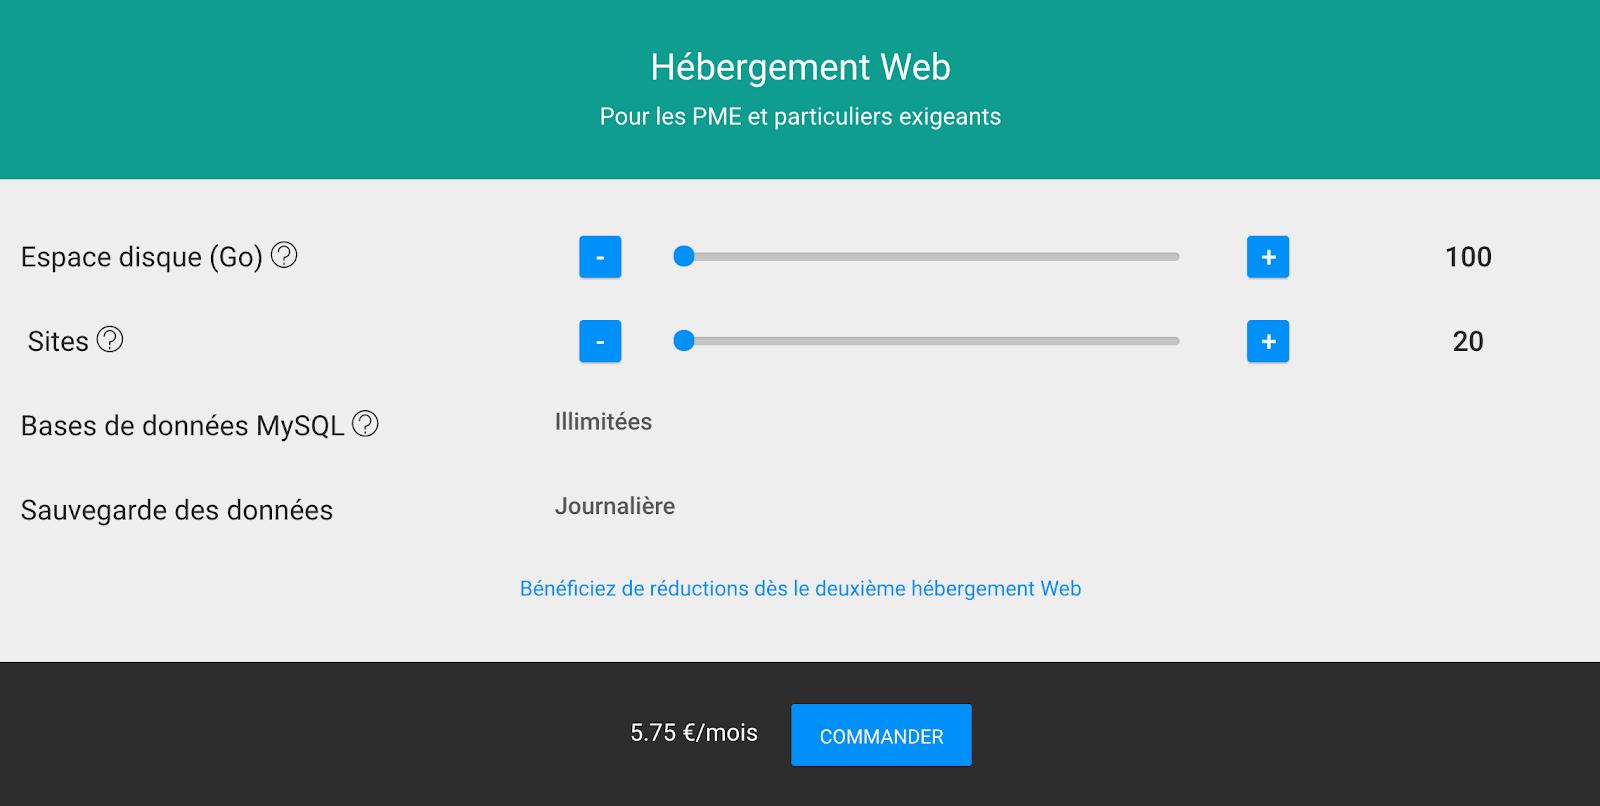 L'hébergement Web